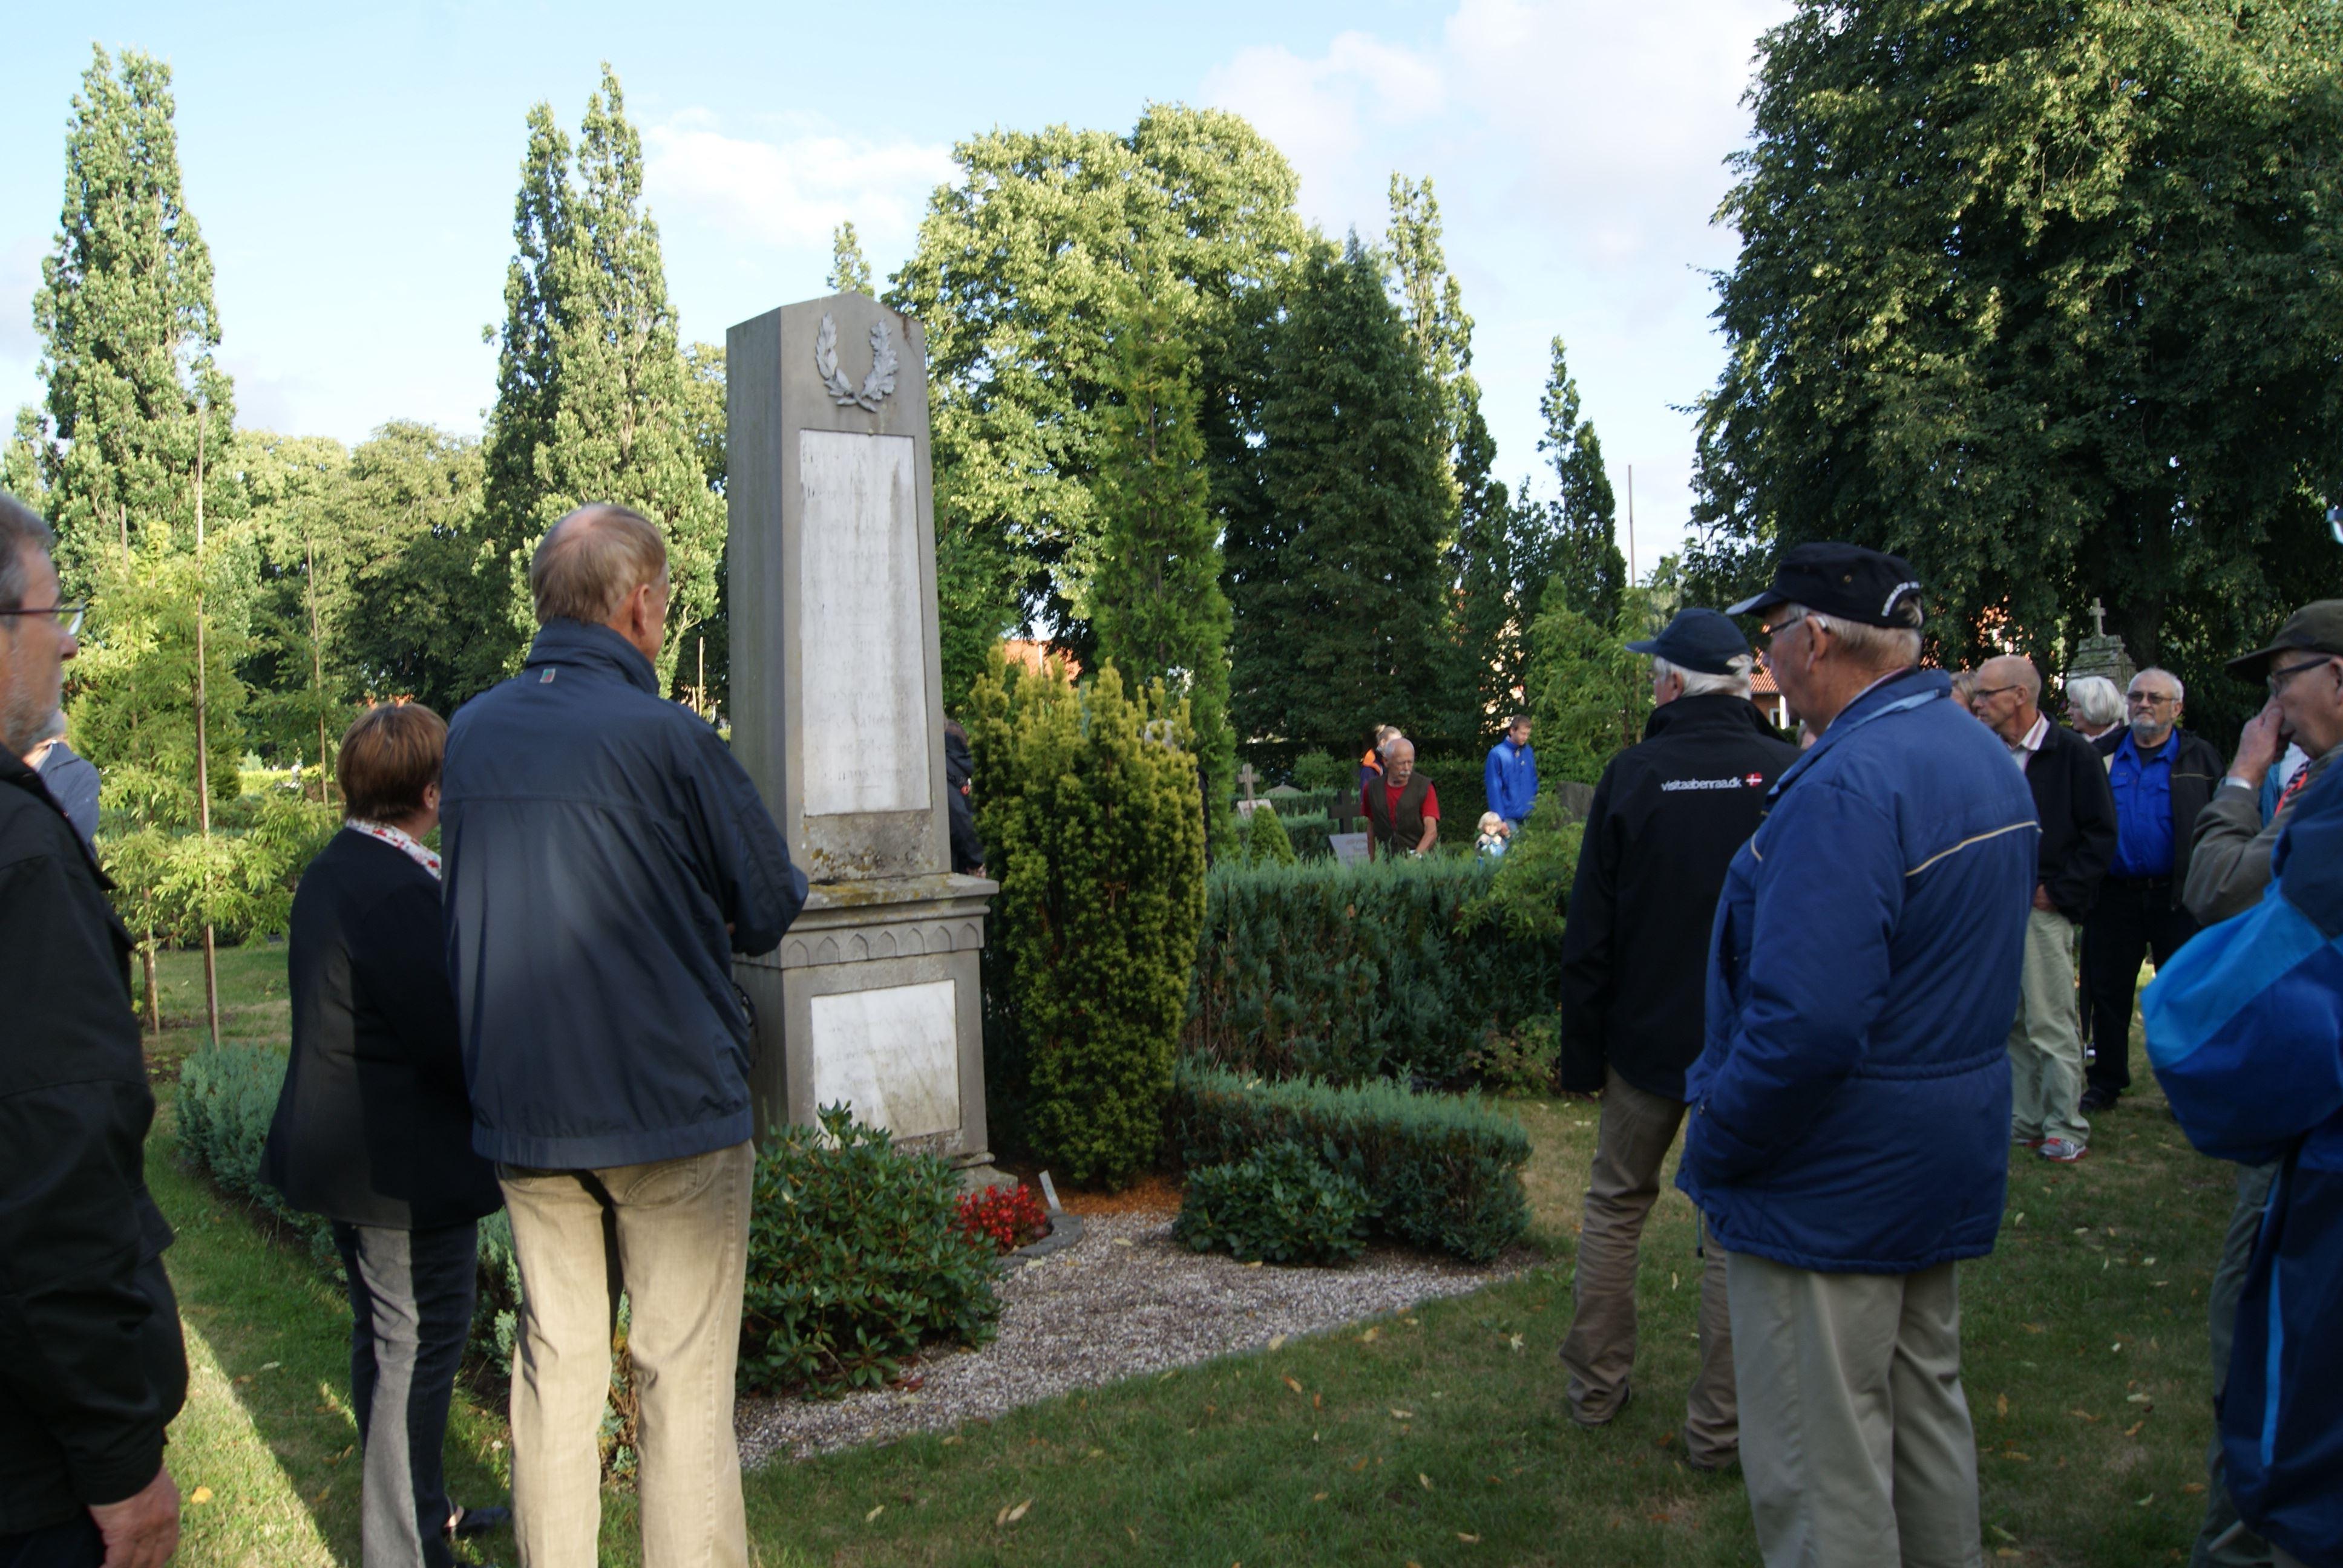 Graveyard tour in Aabenraa